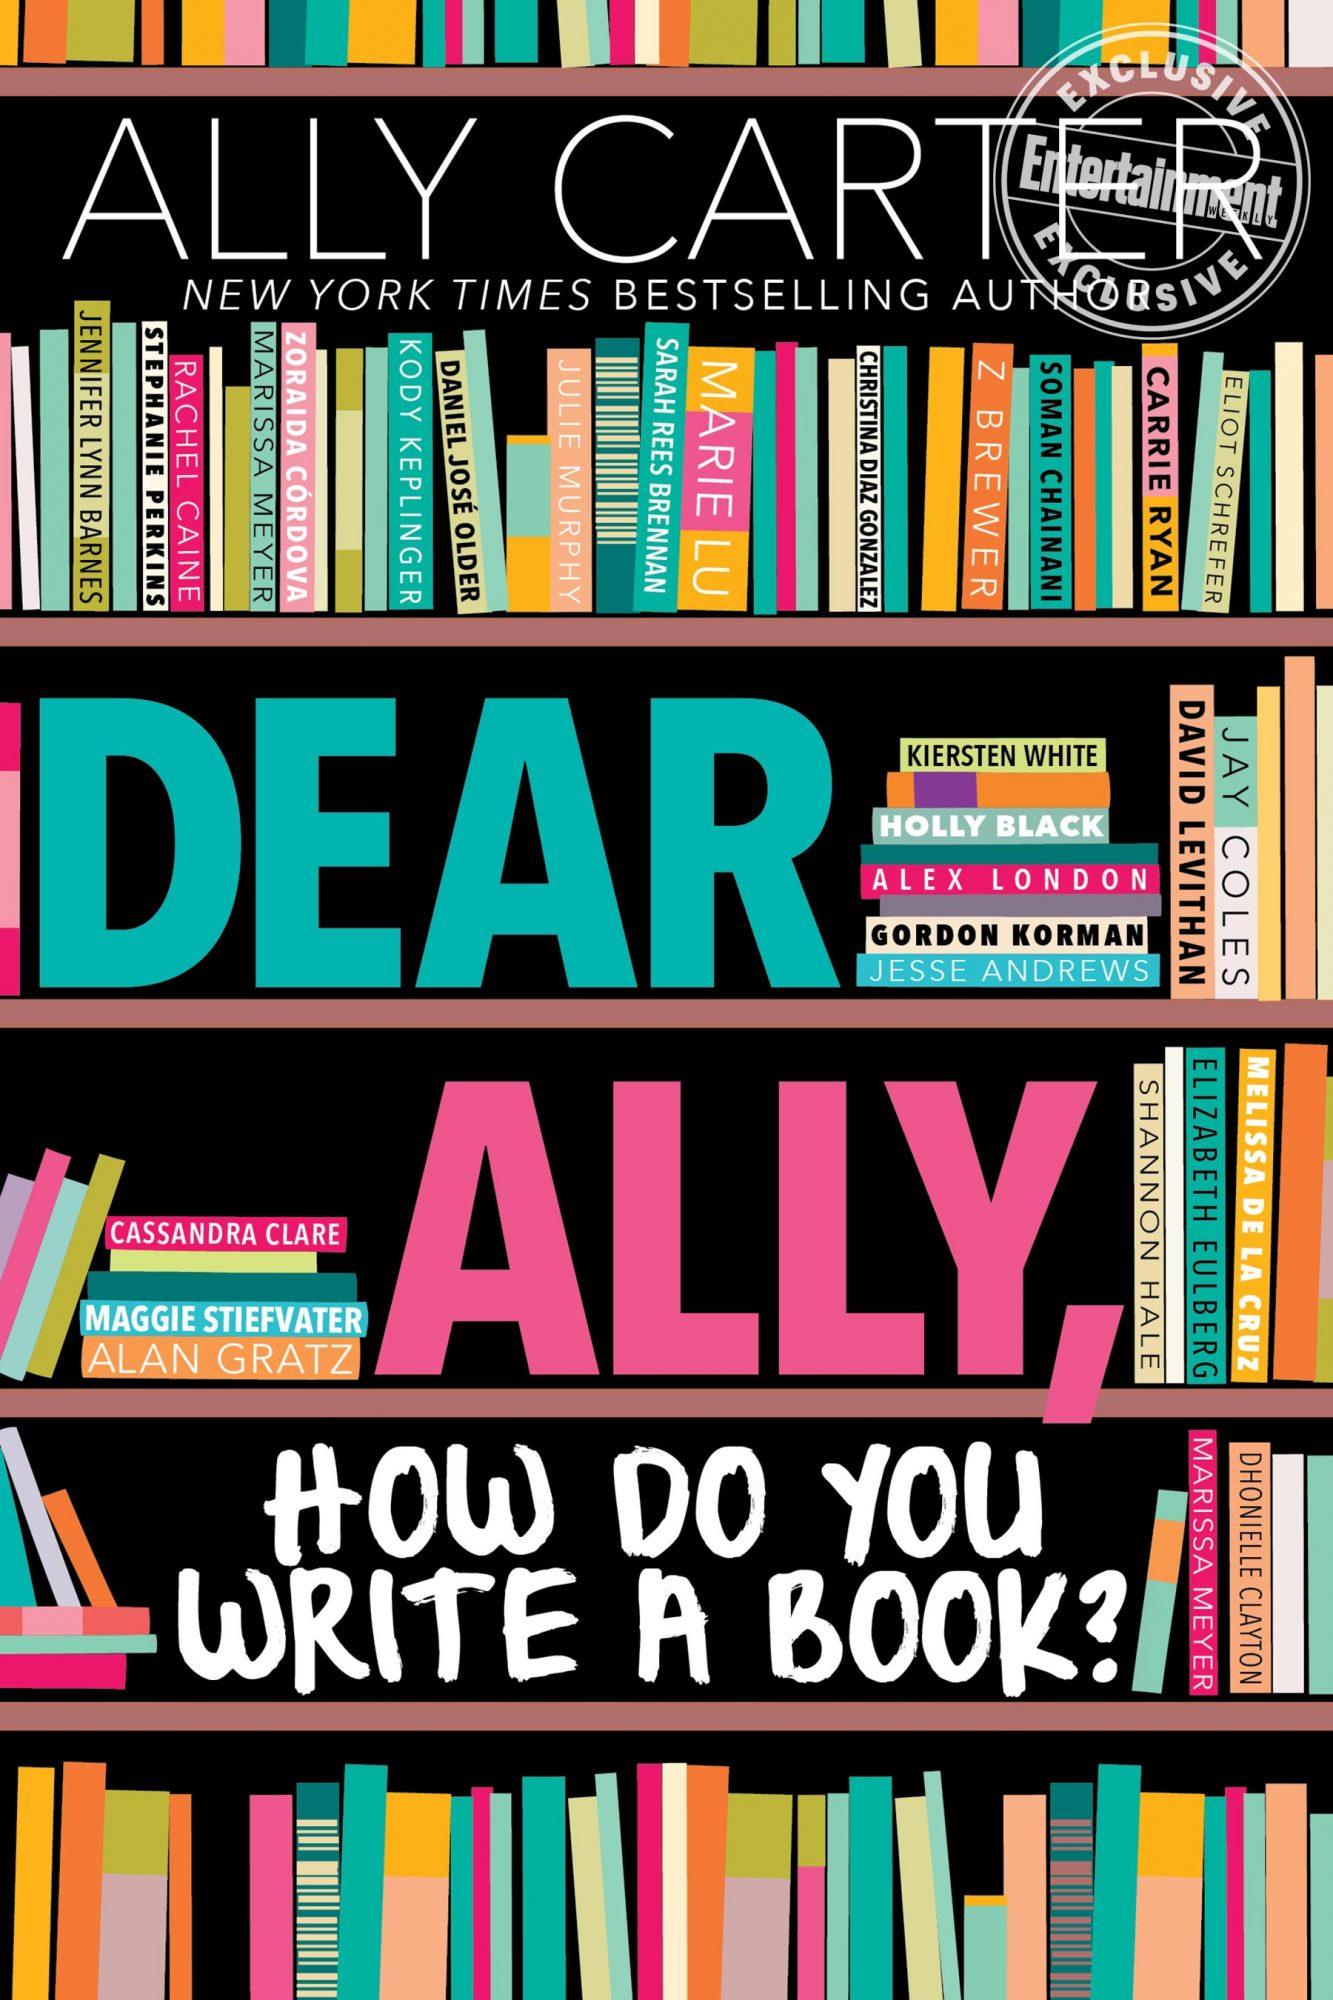 Dear_Ally_cvr_FINAL